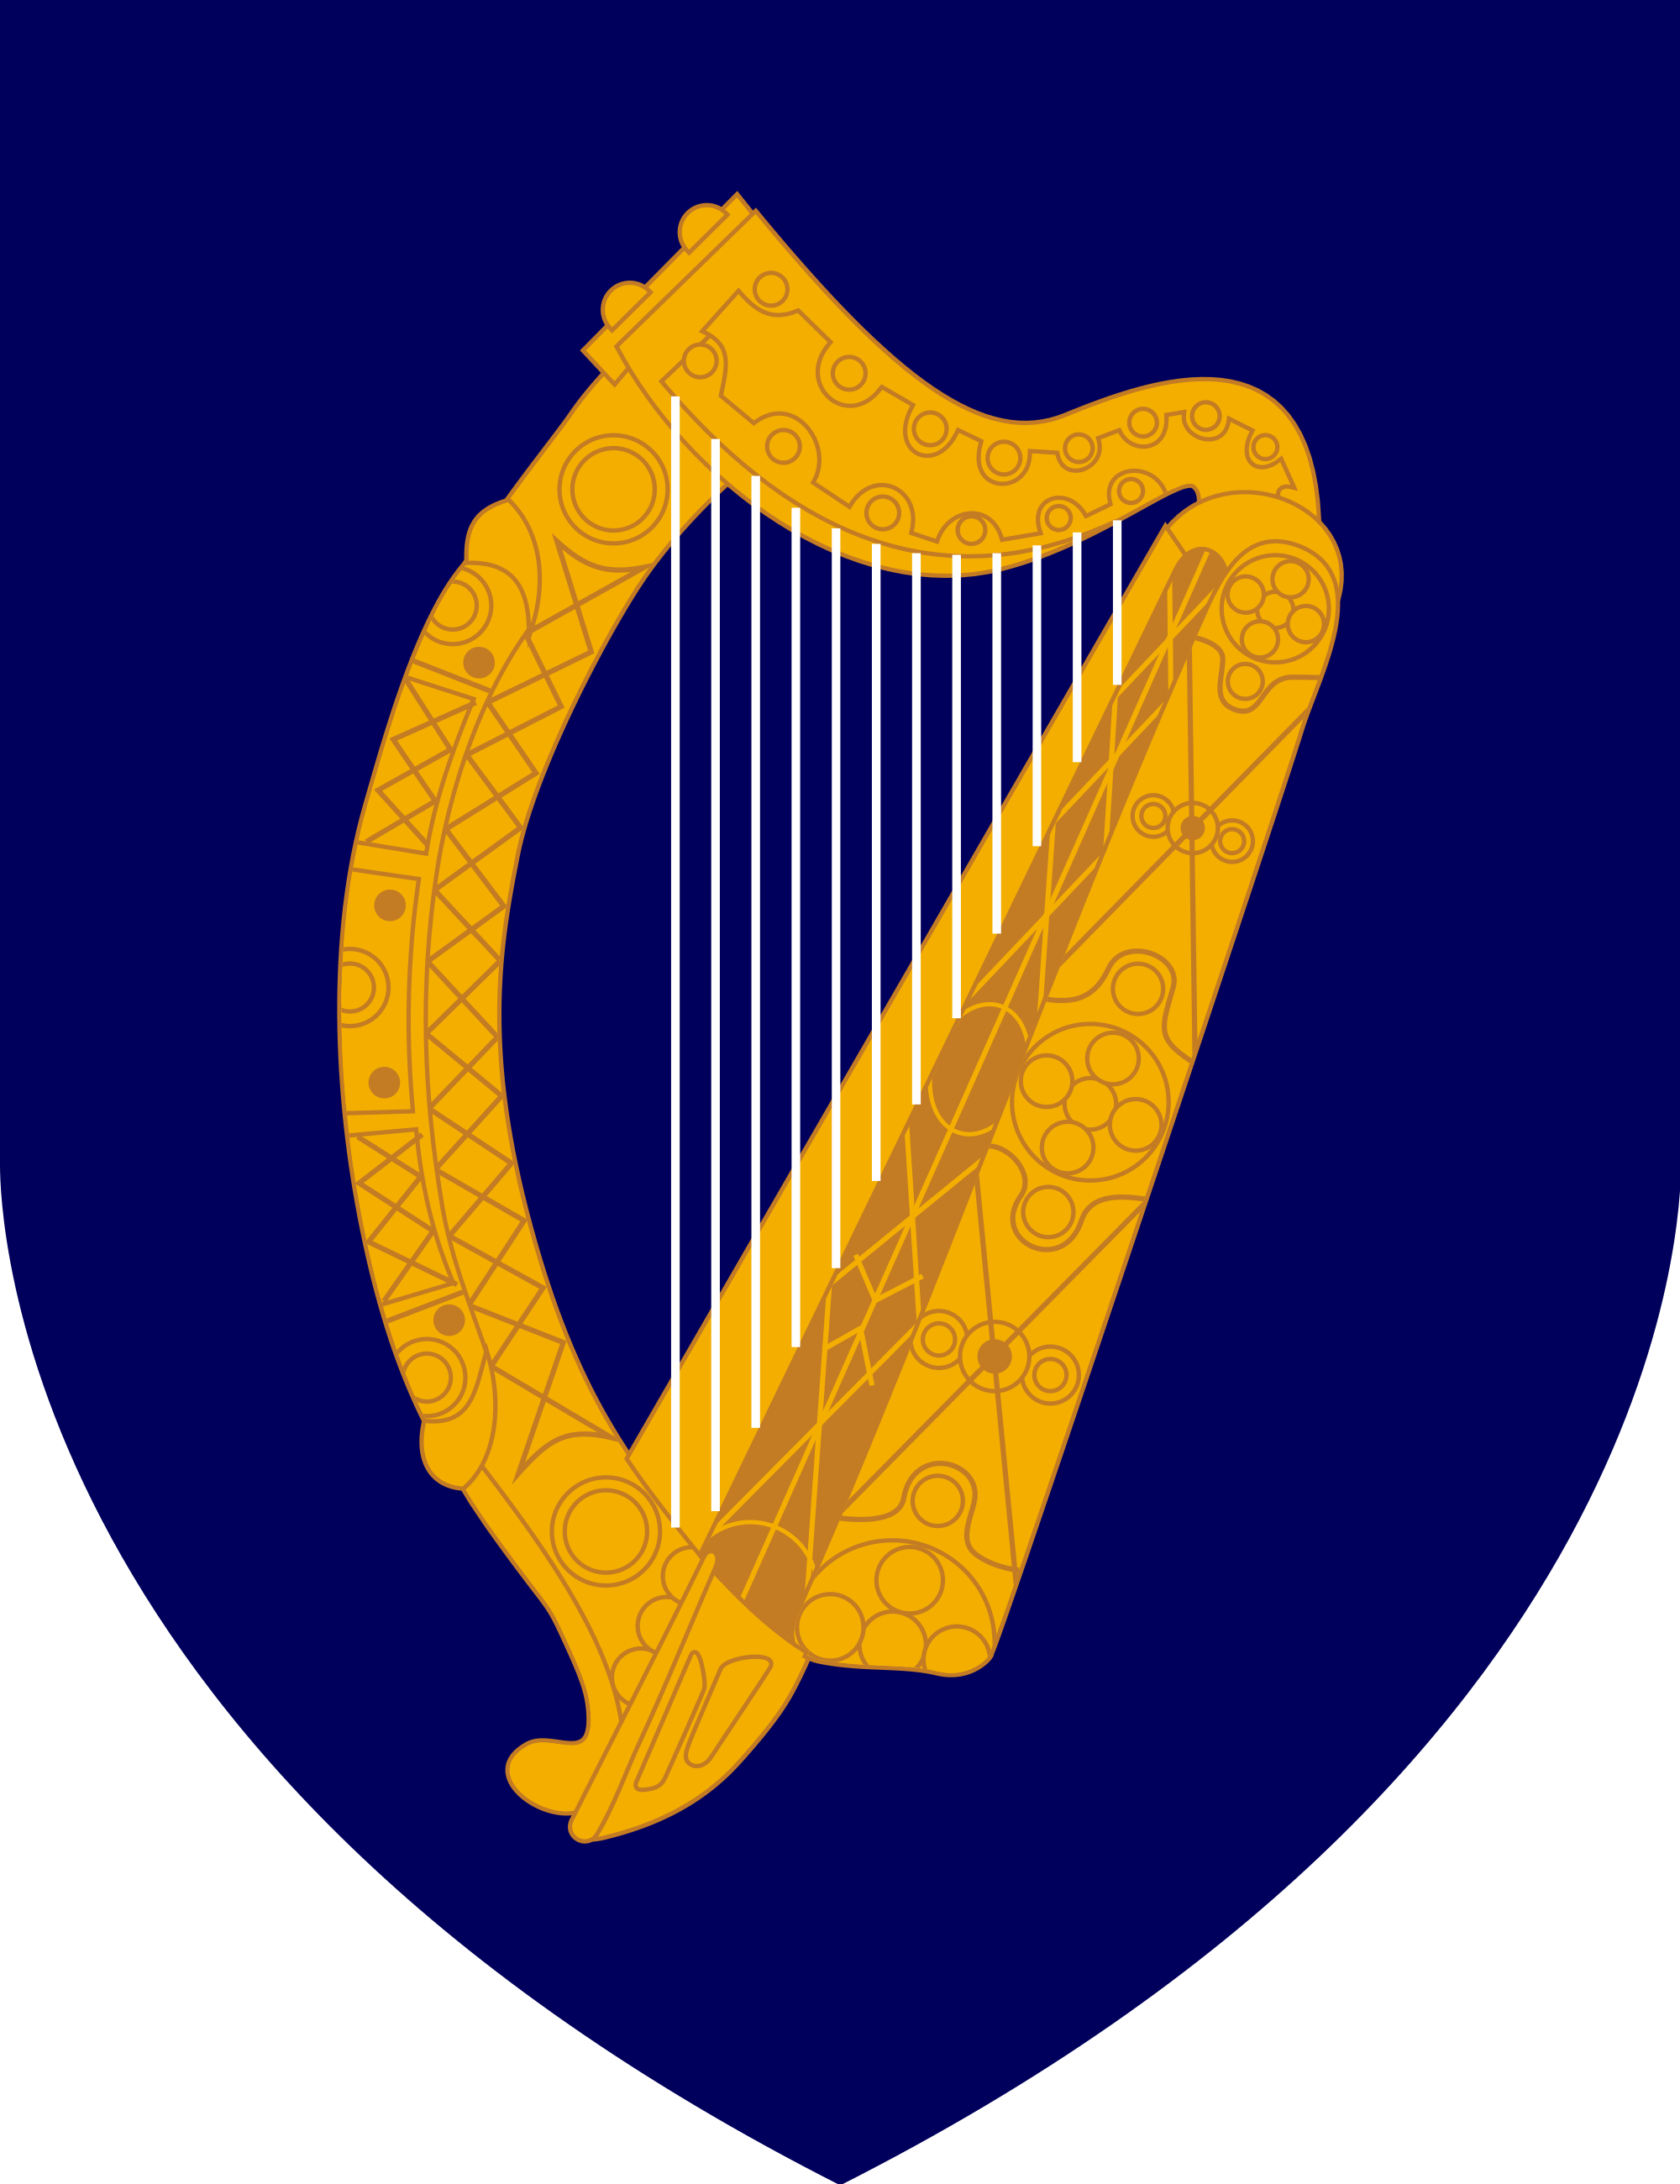 Irlannin vaakuna